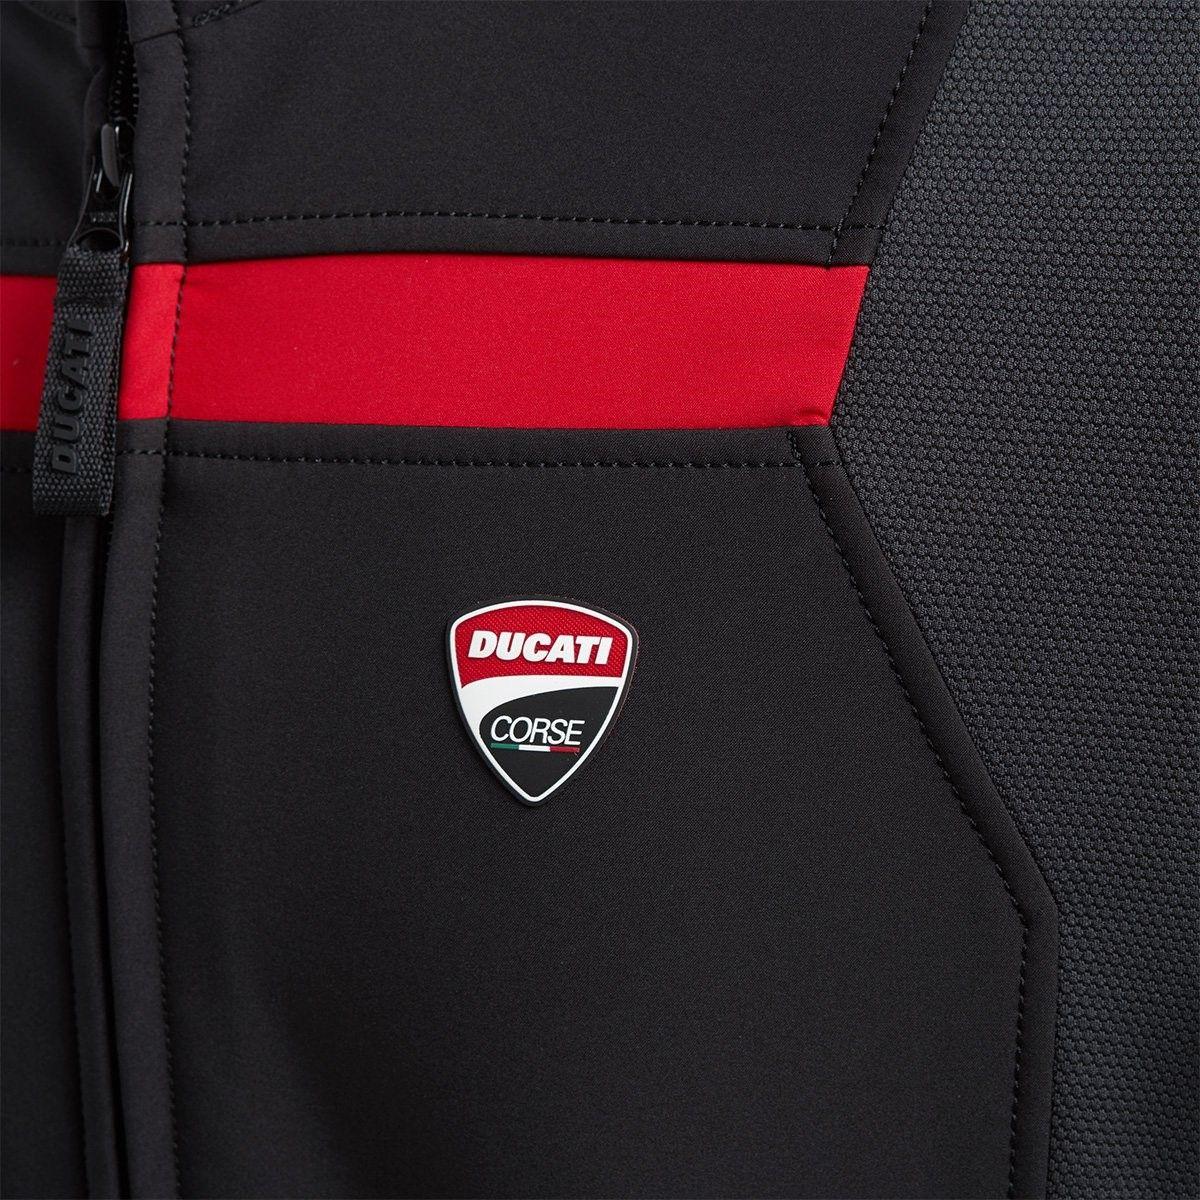 【DUCATI performance】Ducati Corse 3 防風夾克 - 「Webike-摩托百貨」